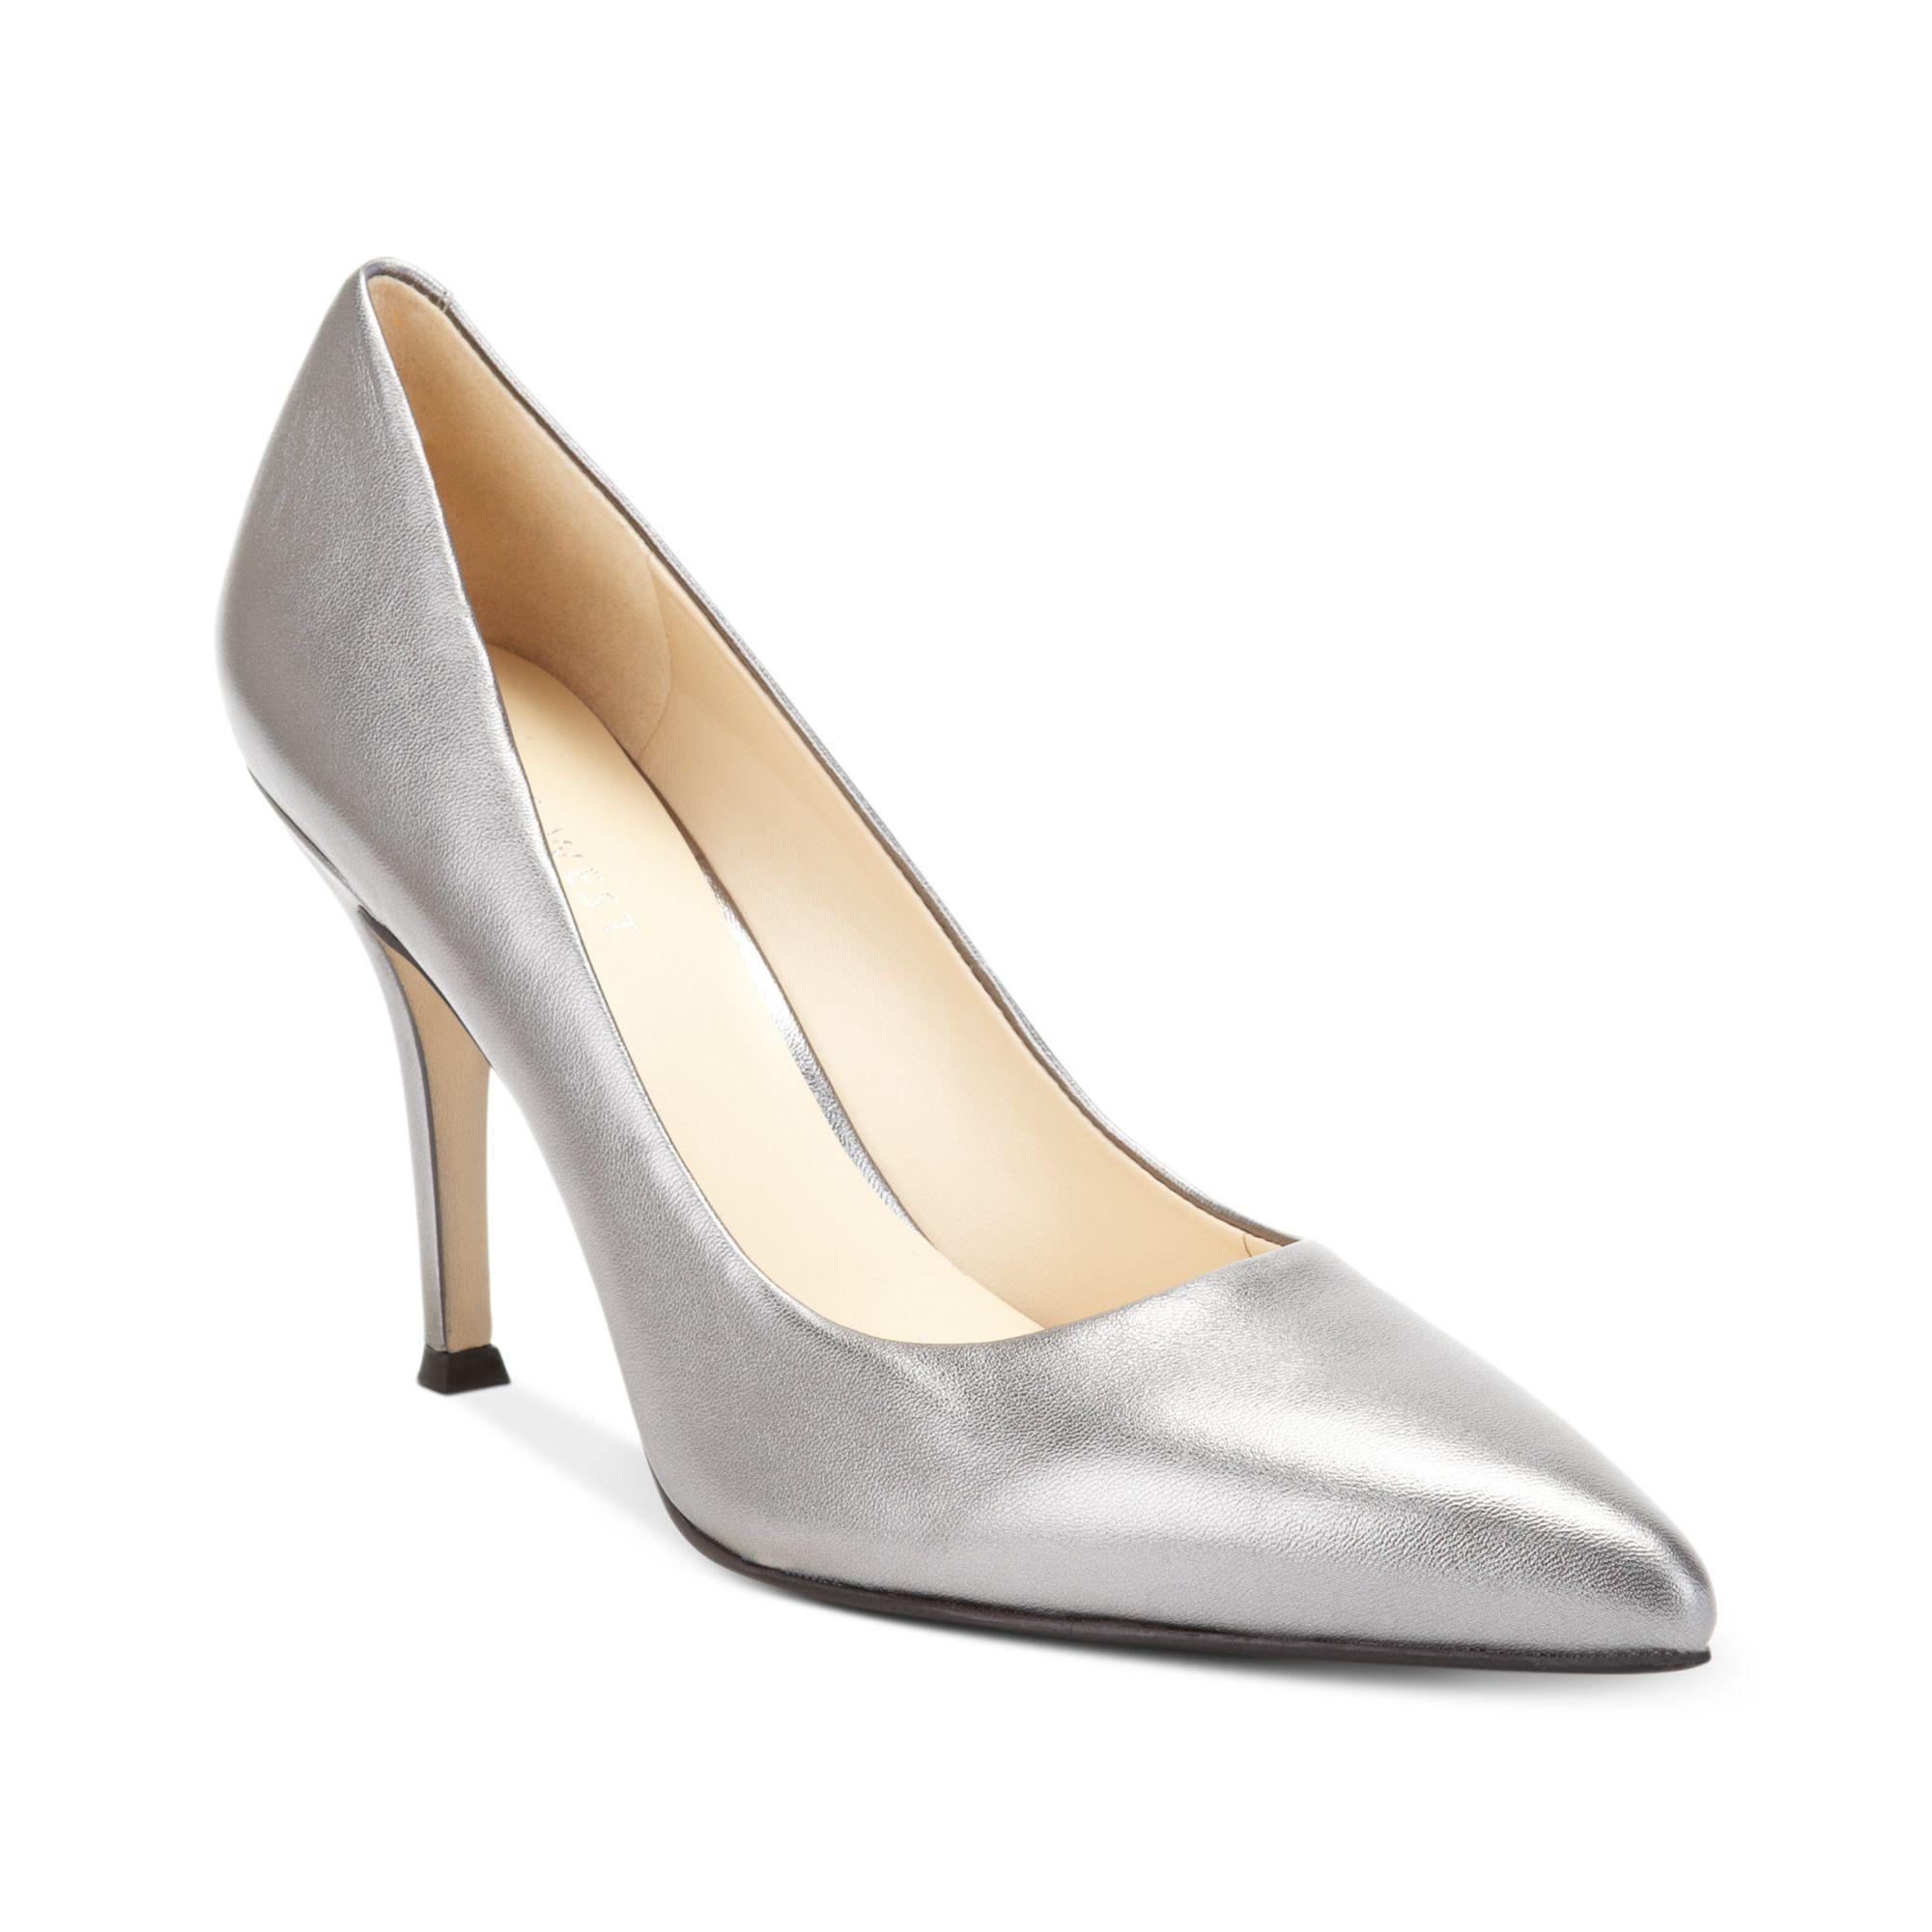 Nine West Dress Shoes Pewter